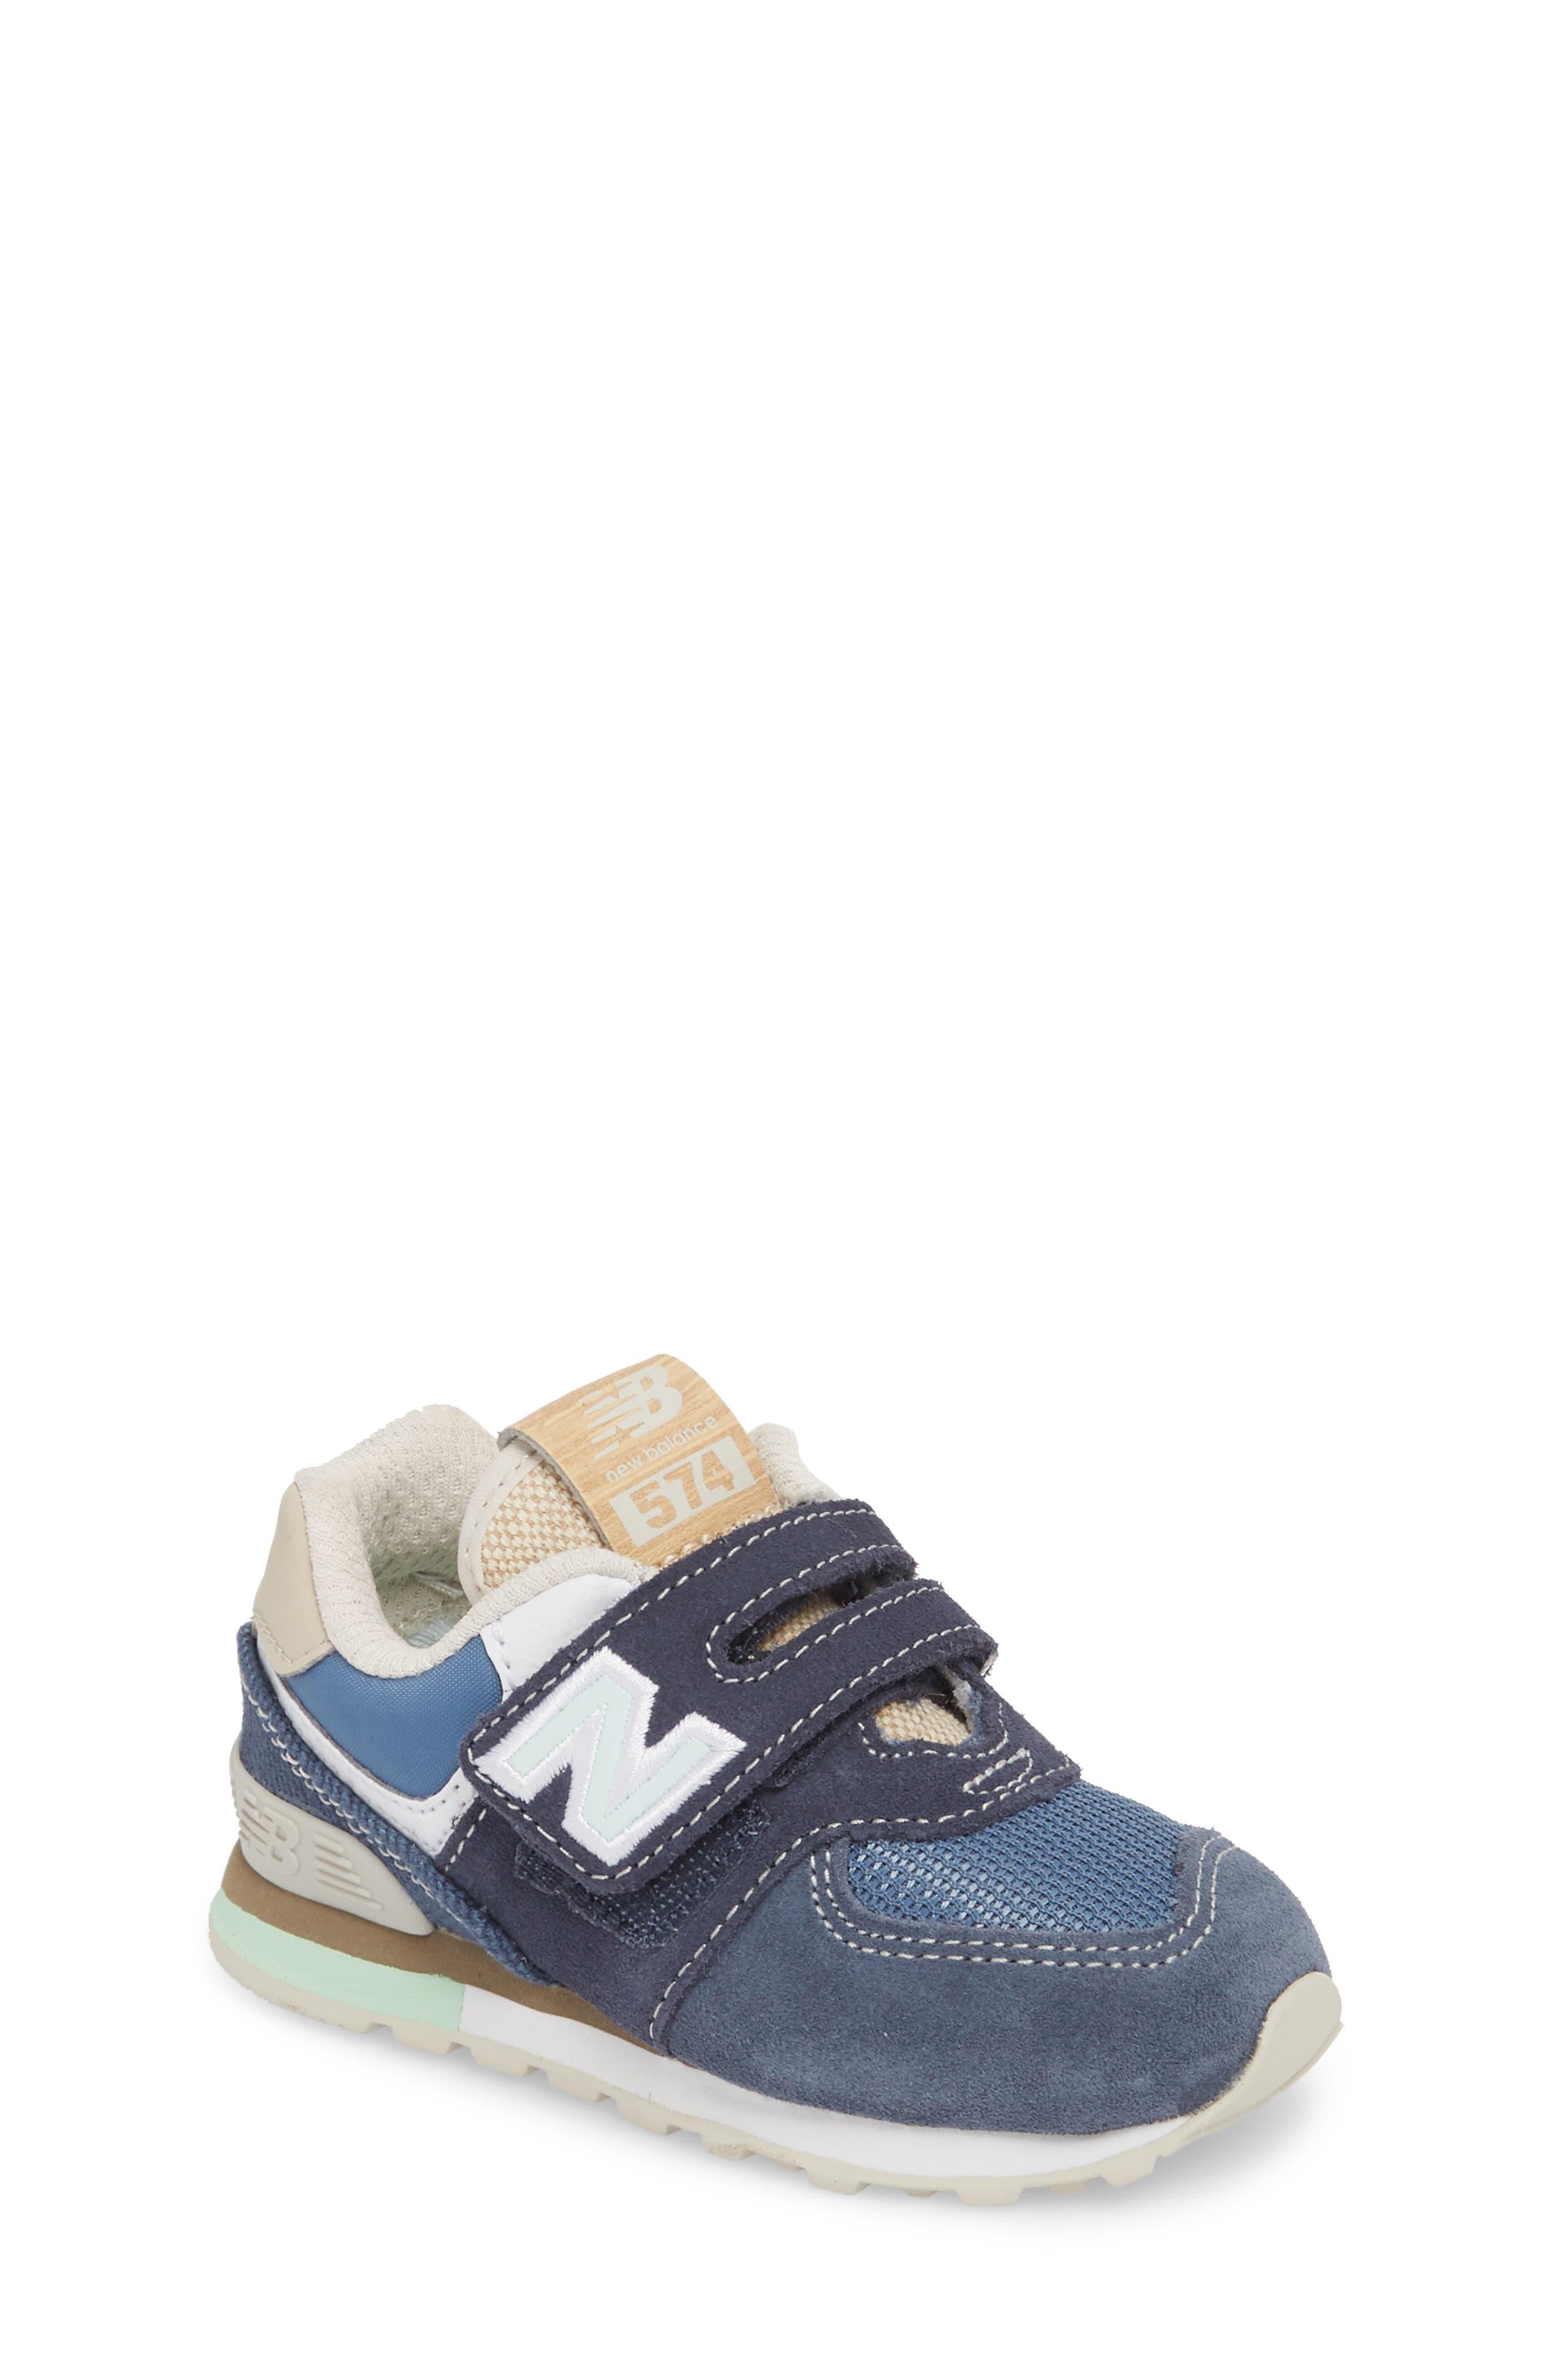 New Balance 574 Retro Surf Sneaker (Baby, Walker, Toddler, Little Kid & Big Kid)